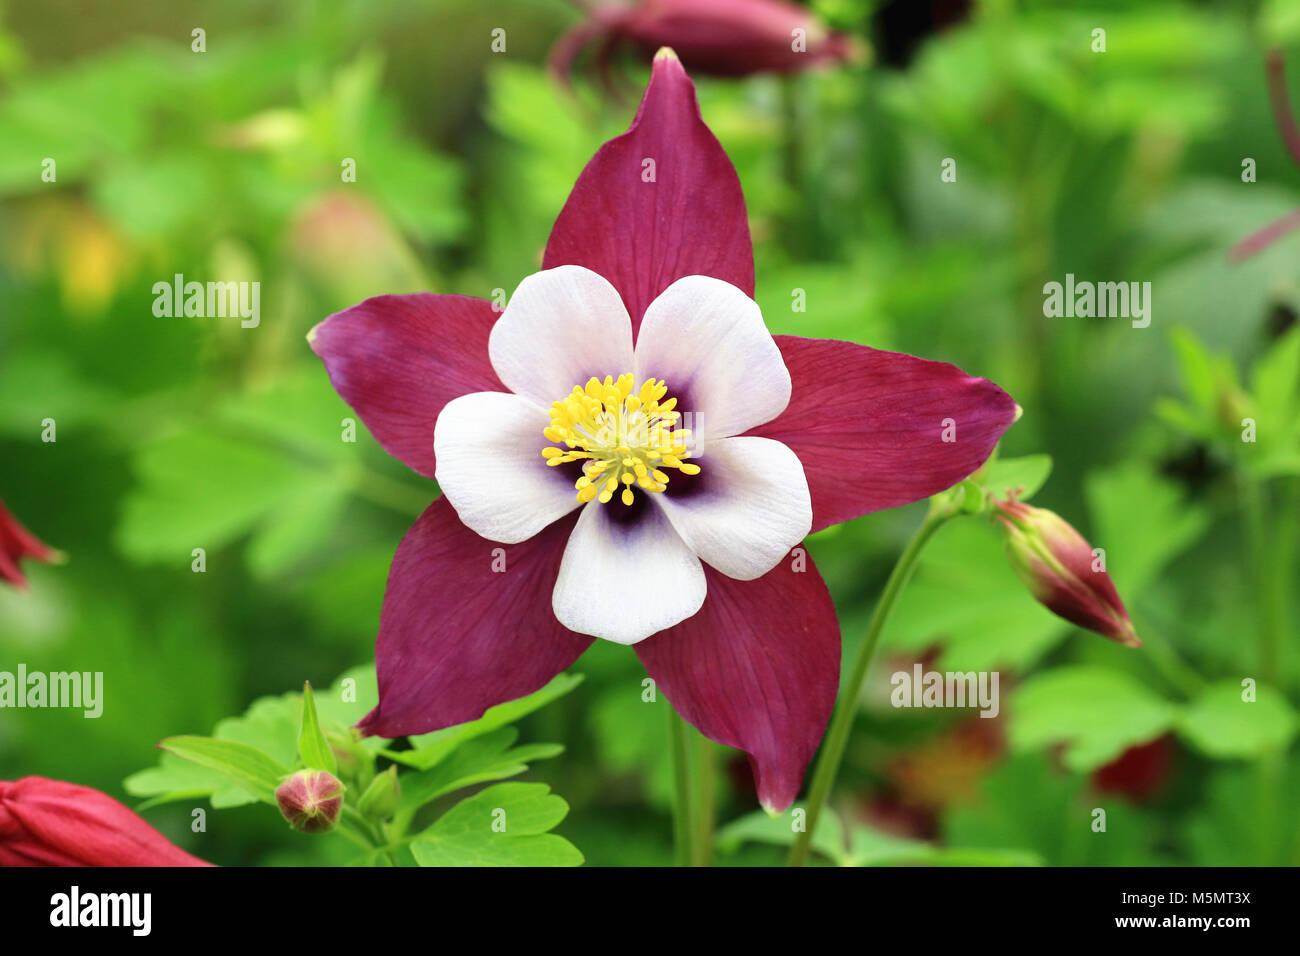 Columbine Flower And Budscloseup Of Purple With White Columbine